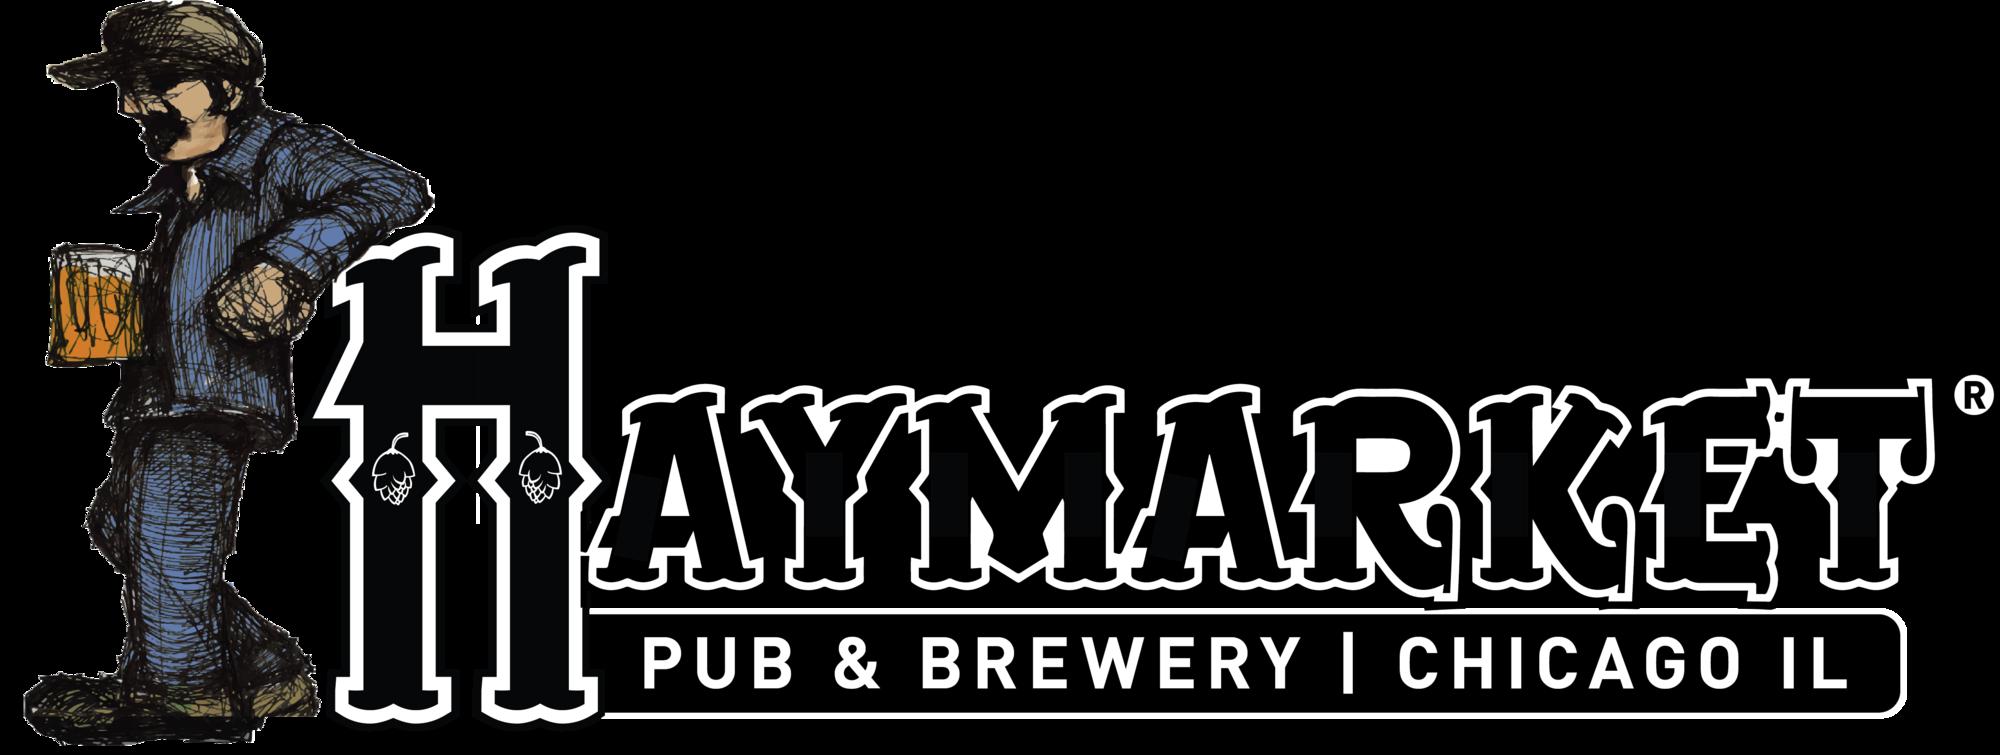 Haymarket Mini Mathias IPA beer Label Full Size